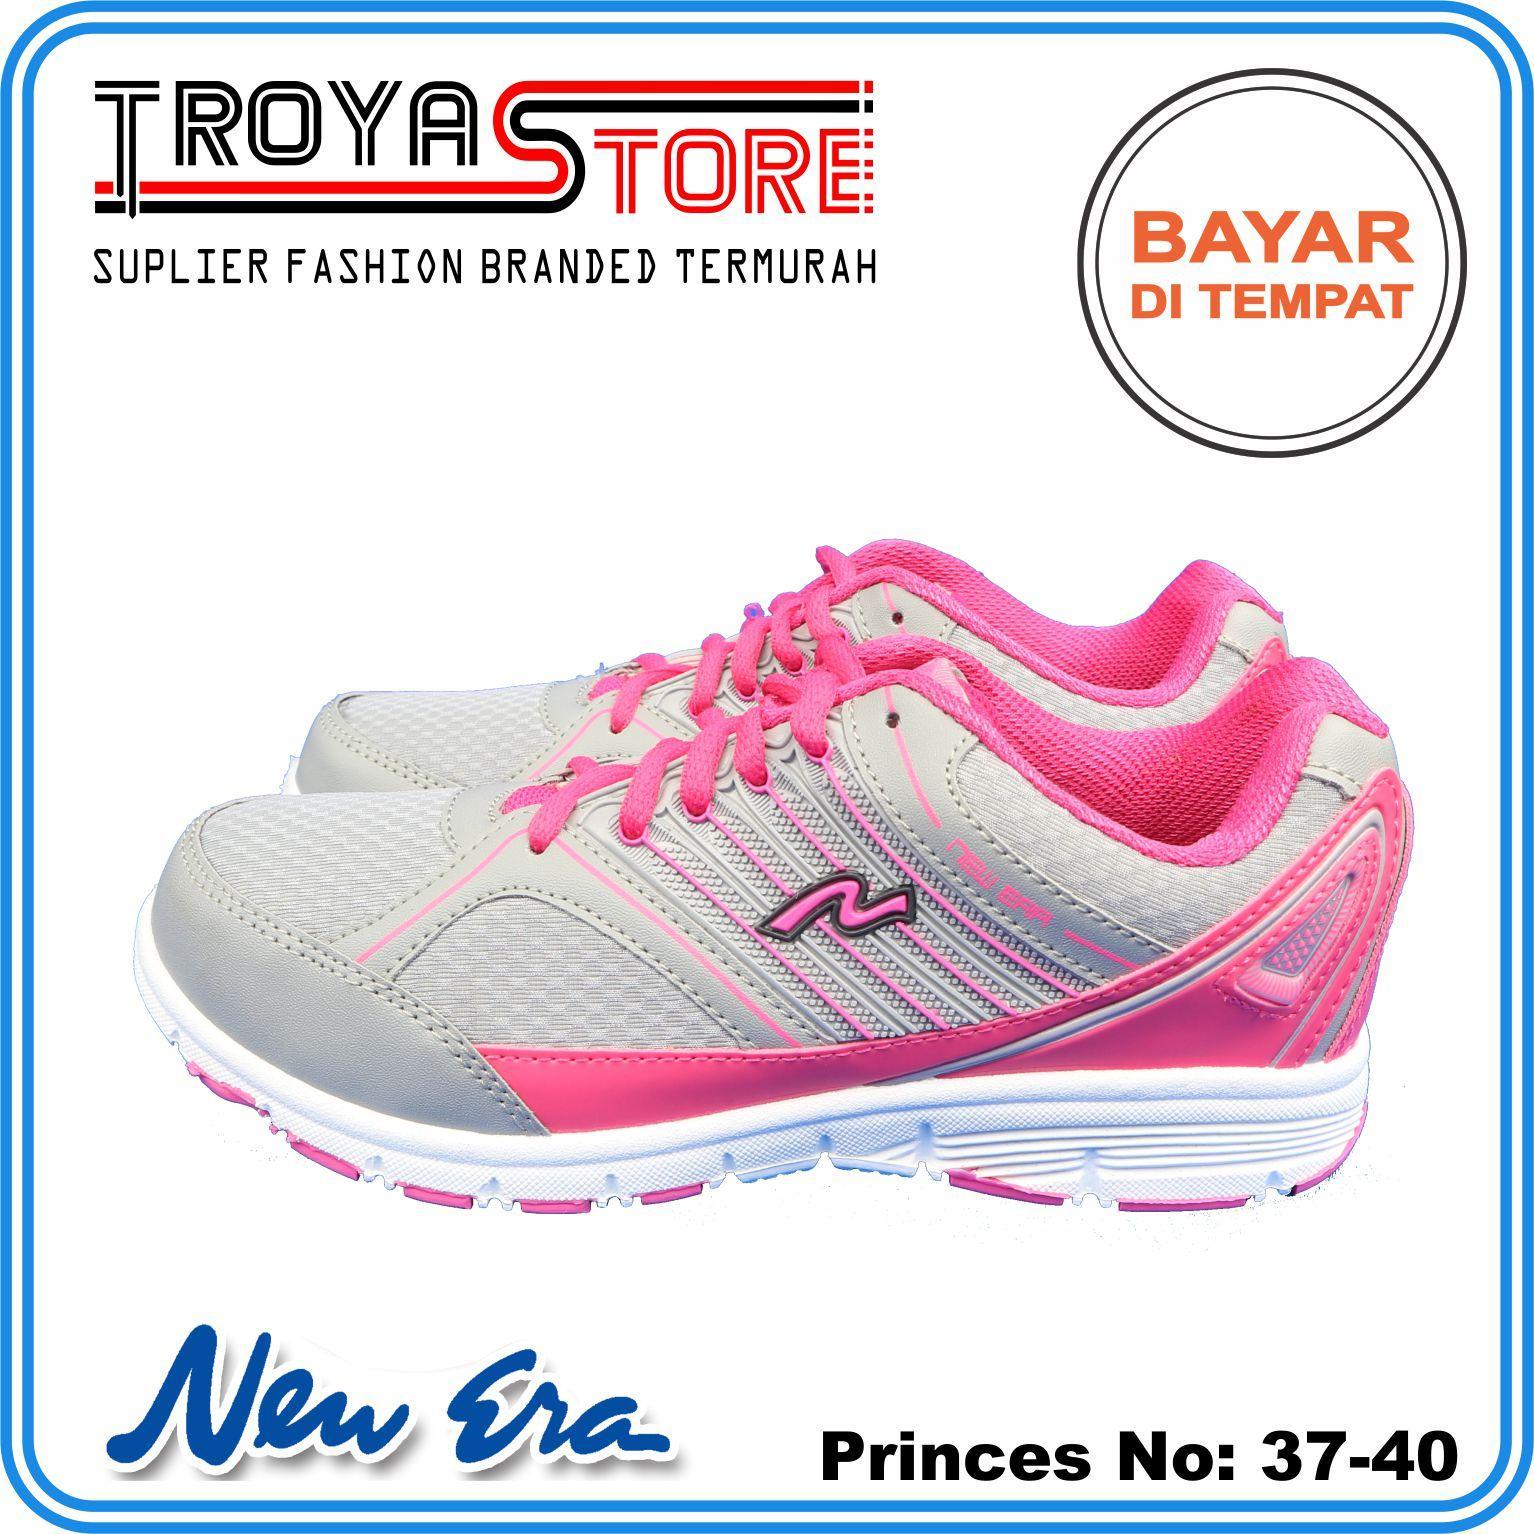 TROYASTORE - NEW ERA Sepatu Wanita Murah PRINCESS Original Abu Hitam Pink    Sepatu Sneakers Wanita 164e9b92f2